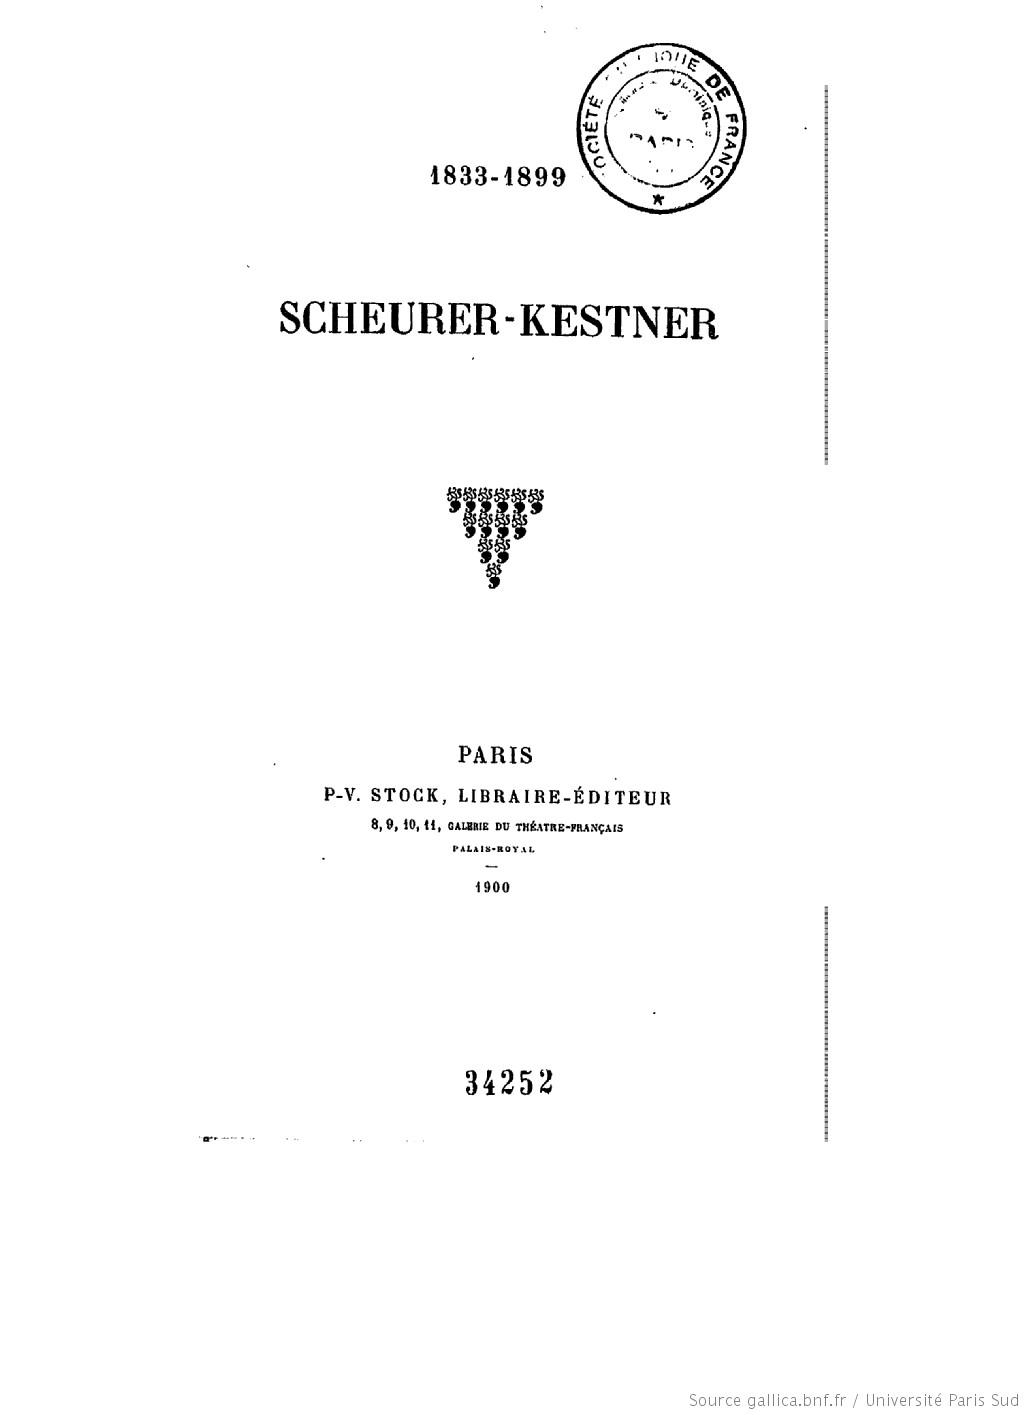 Scheurer-Kestner : 1833-1899